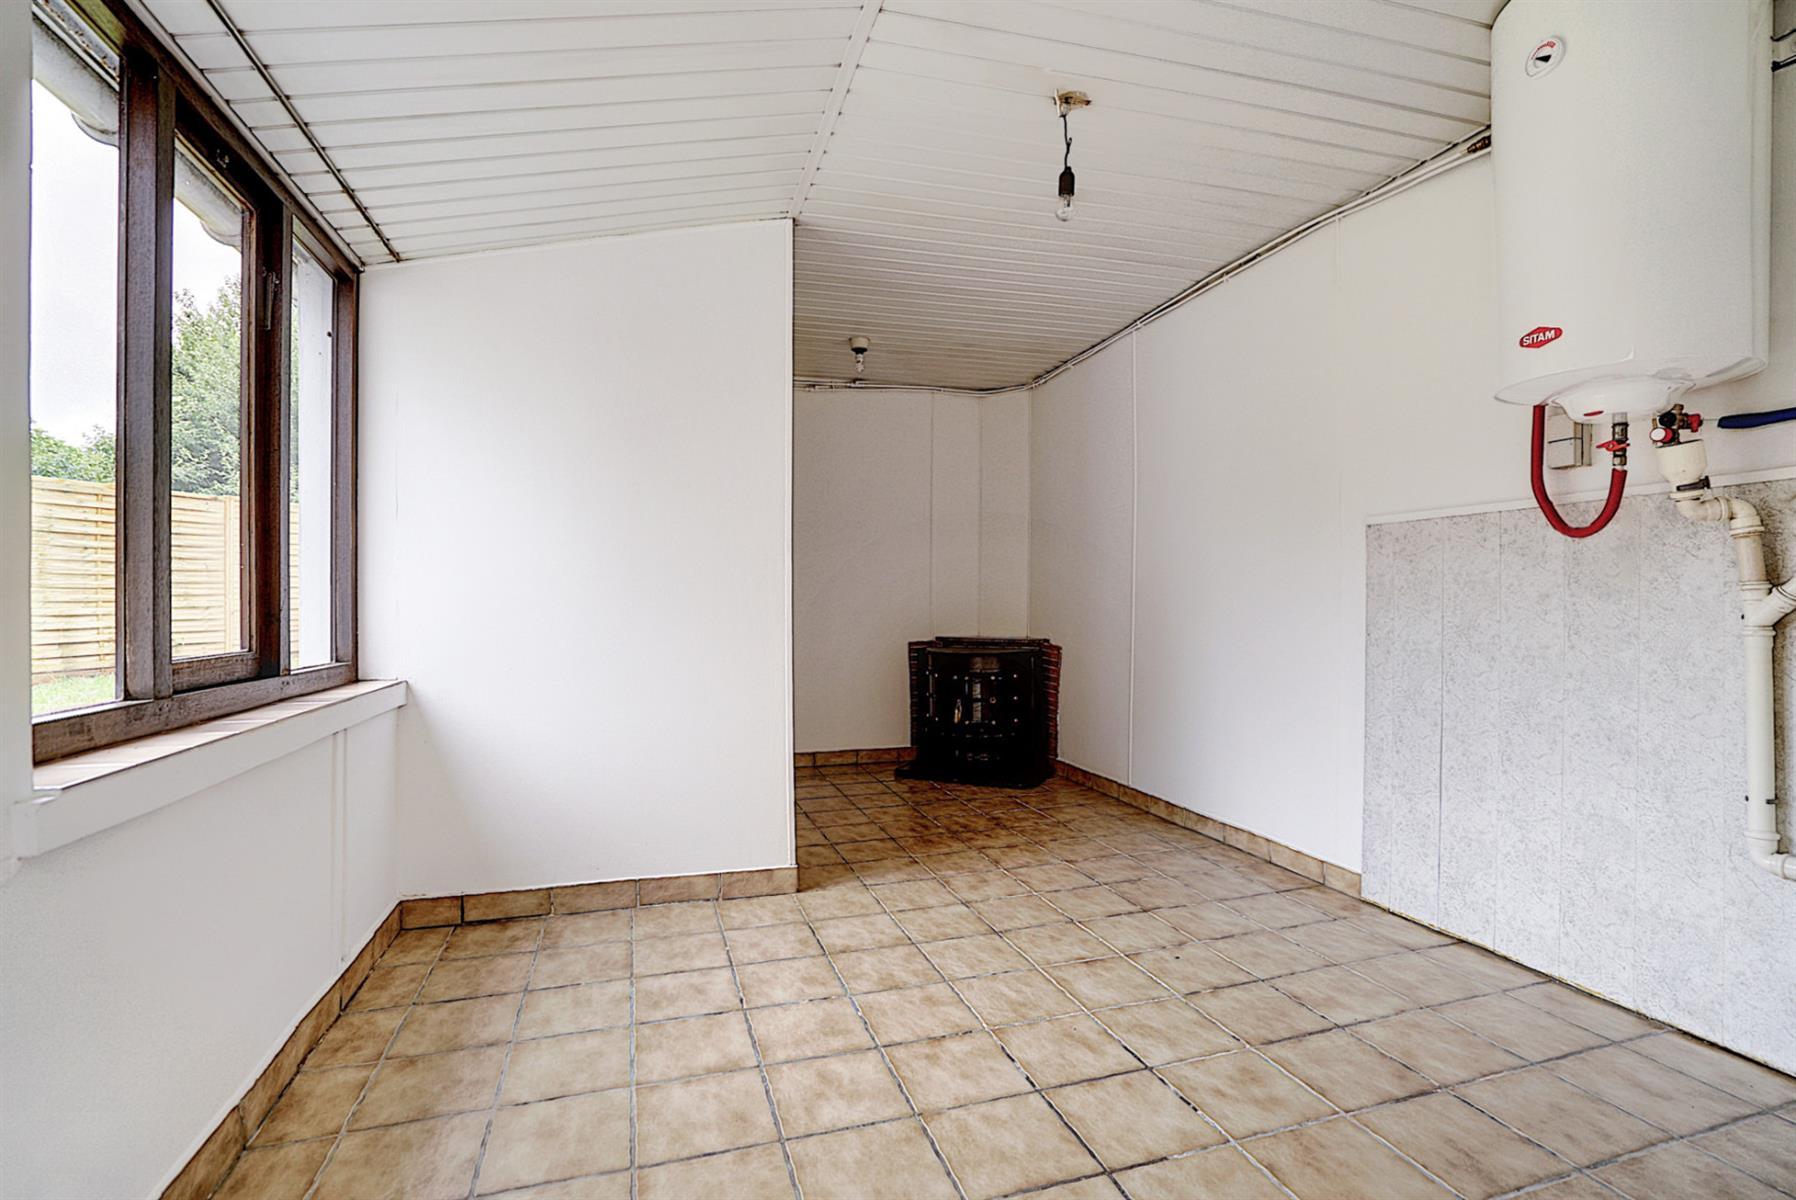 Maison - Ottignies-Louvain-la-Neuve - #3849240-6